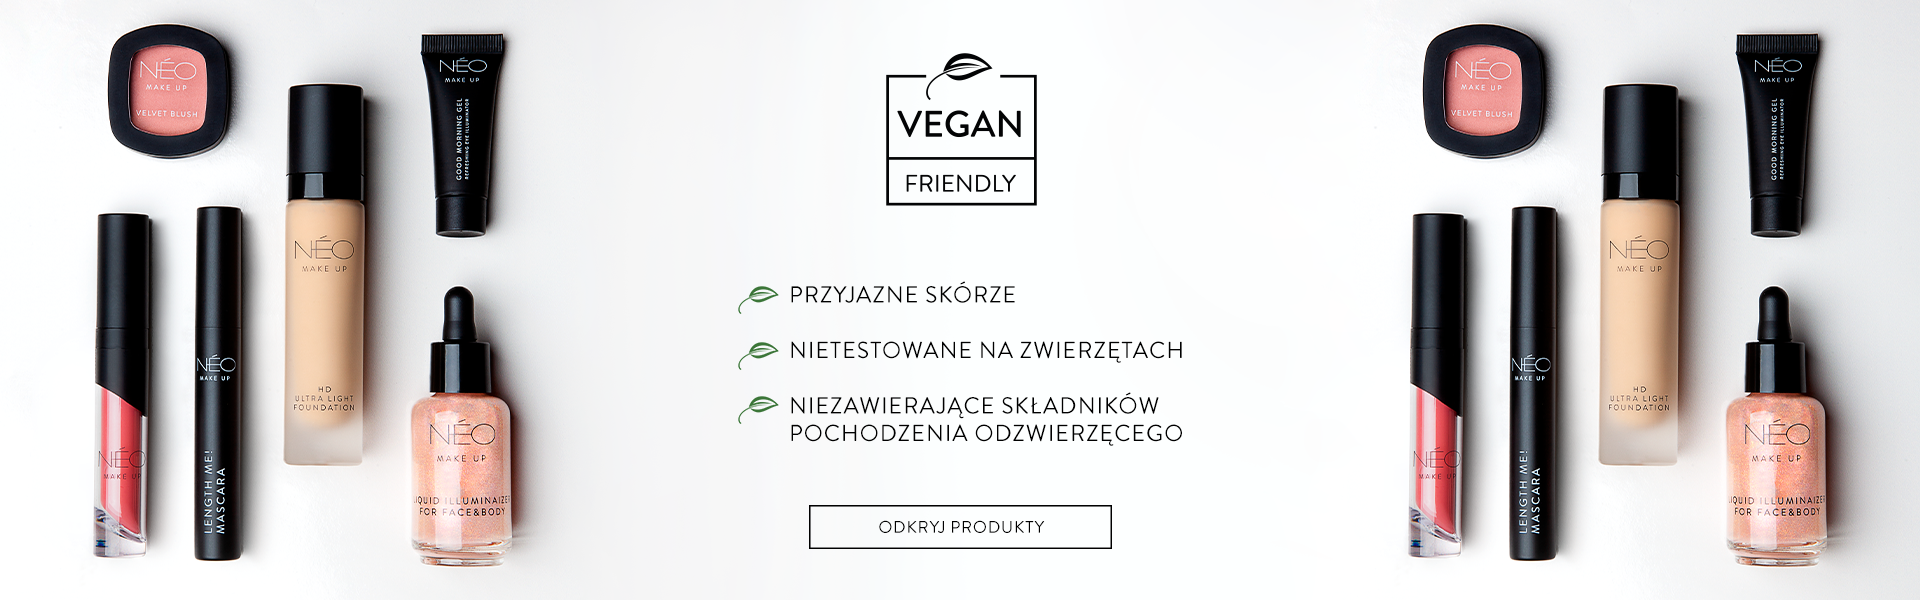 Kosmetyki Vegan friendly NEO Make Up